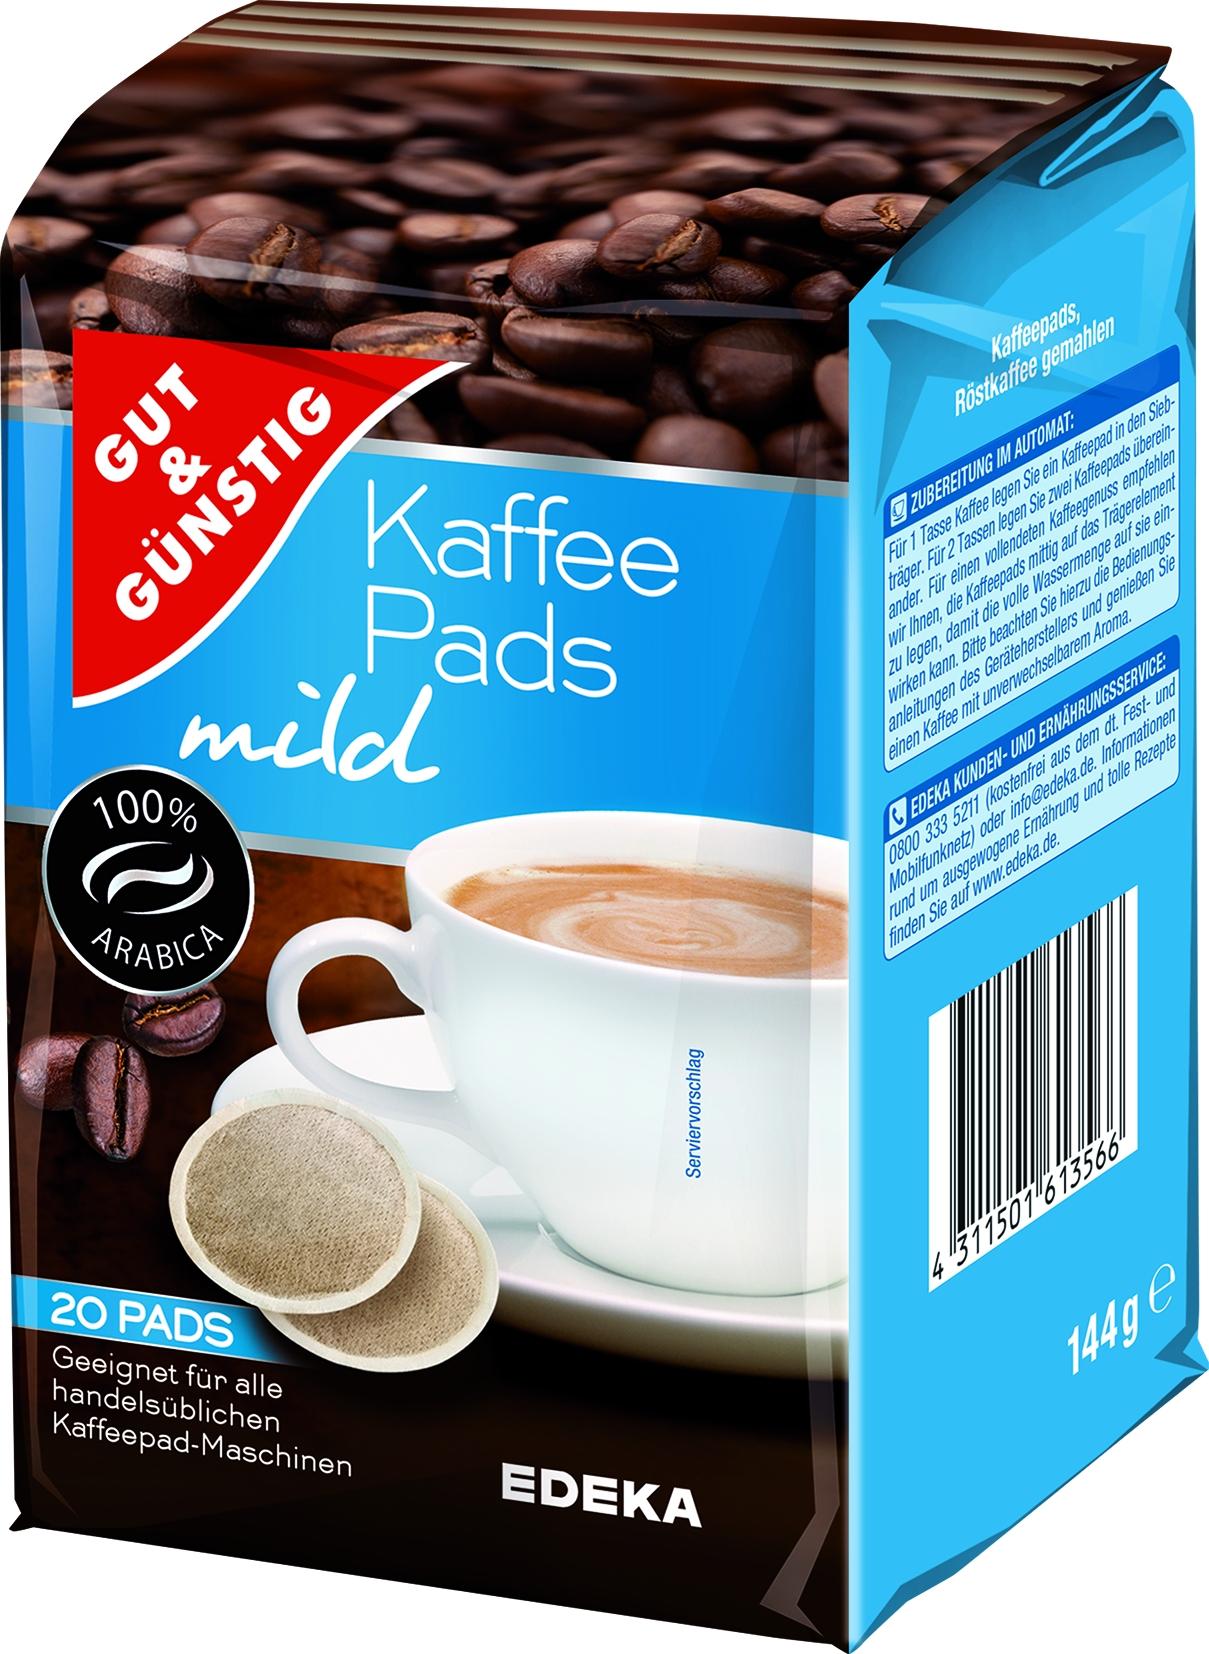 Kaffee Pads mild